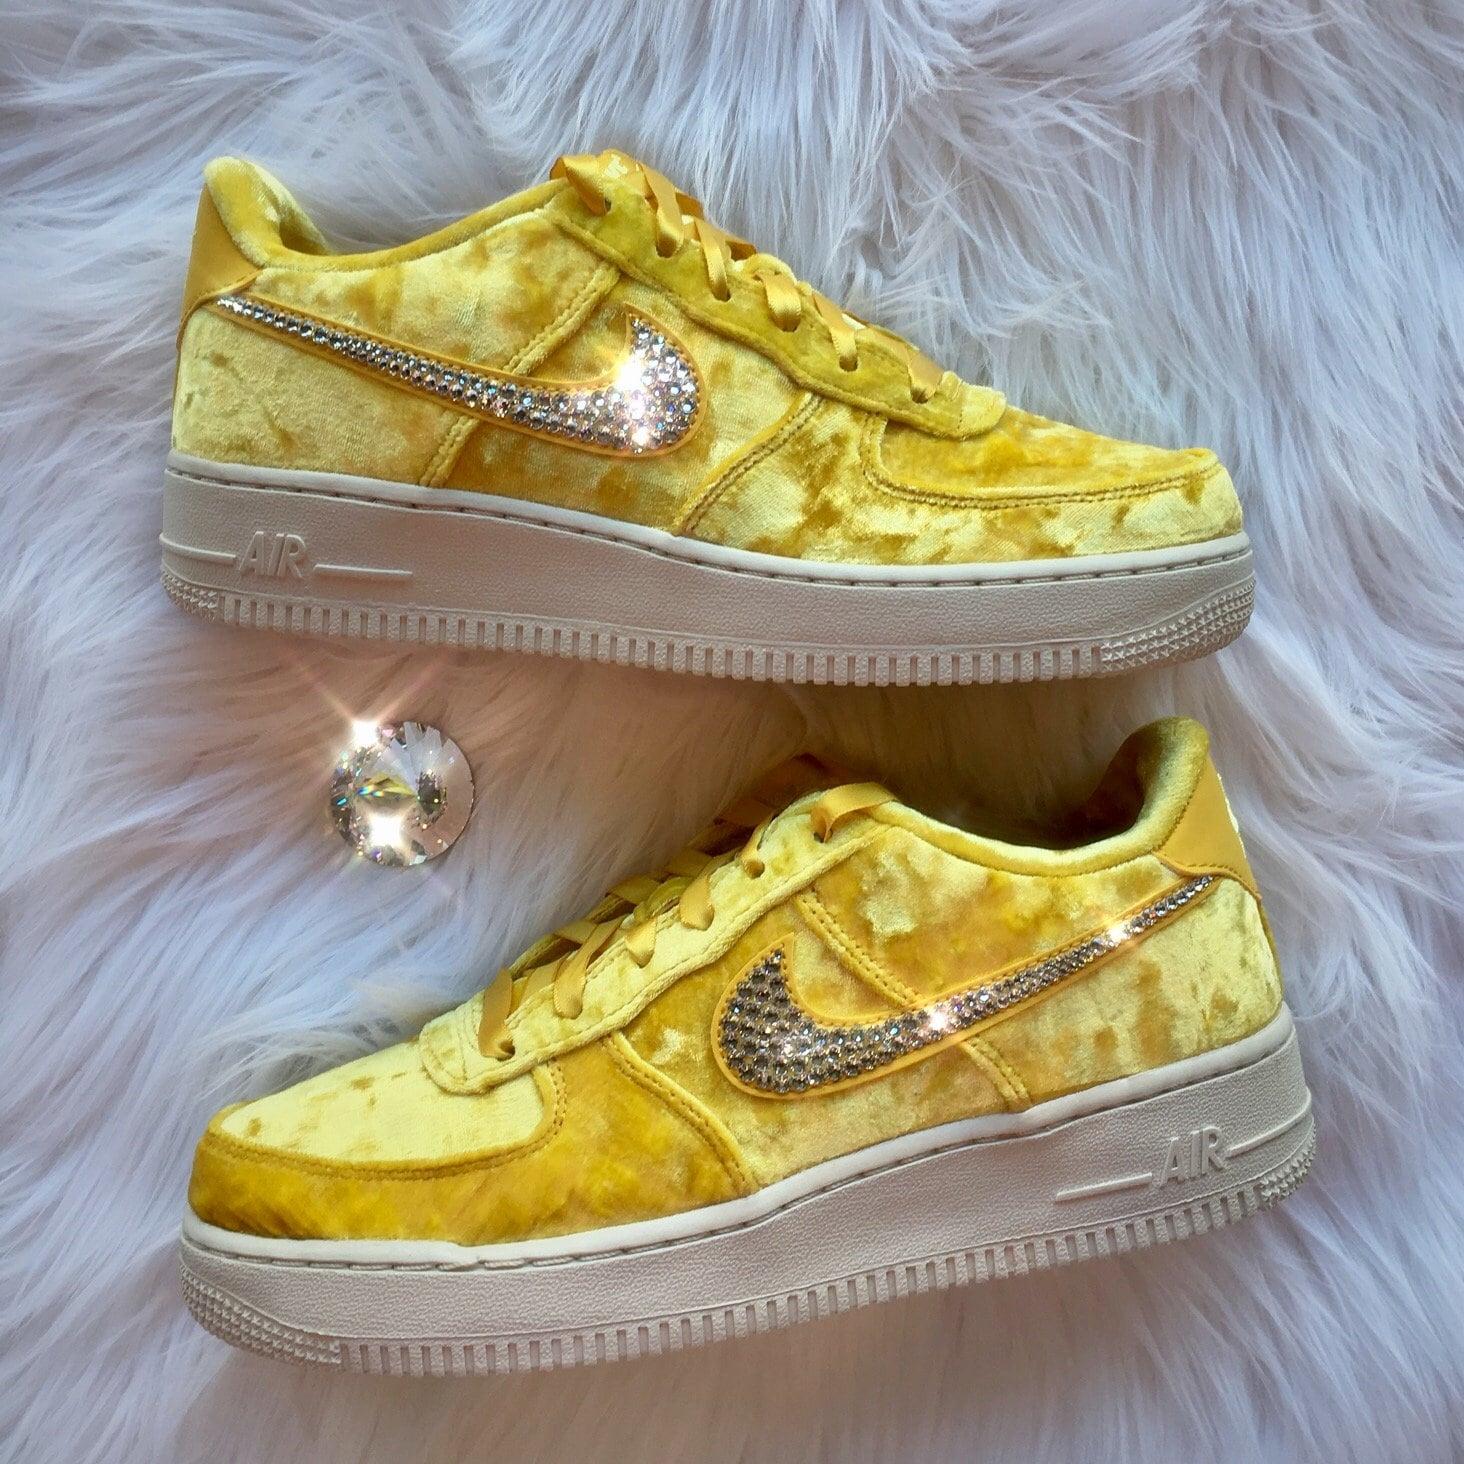 Bling Nike Air Force 1 LV8 Velvet Shoes with Swarovski Crystal